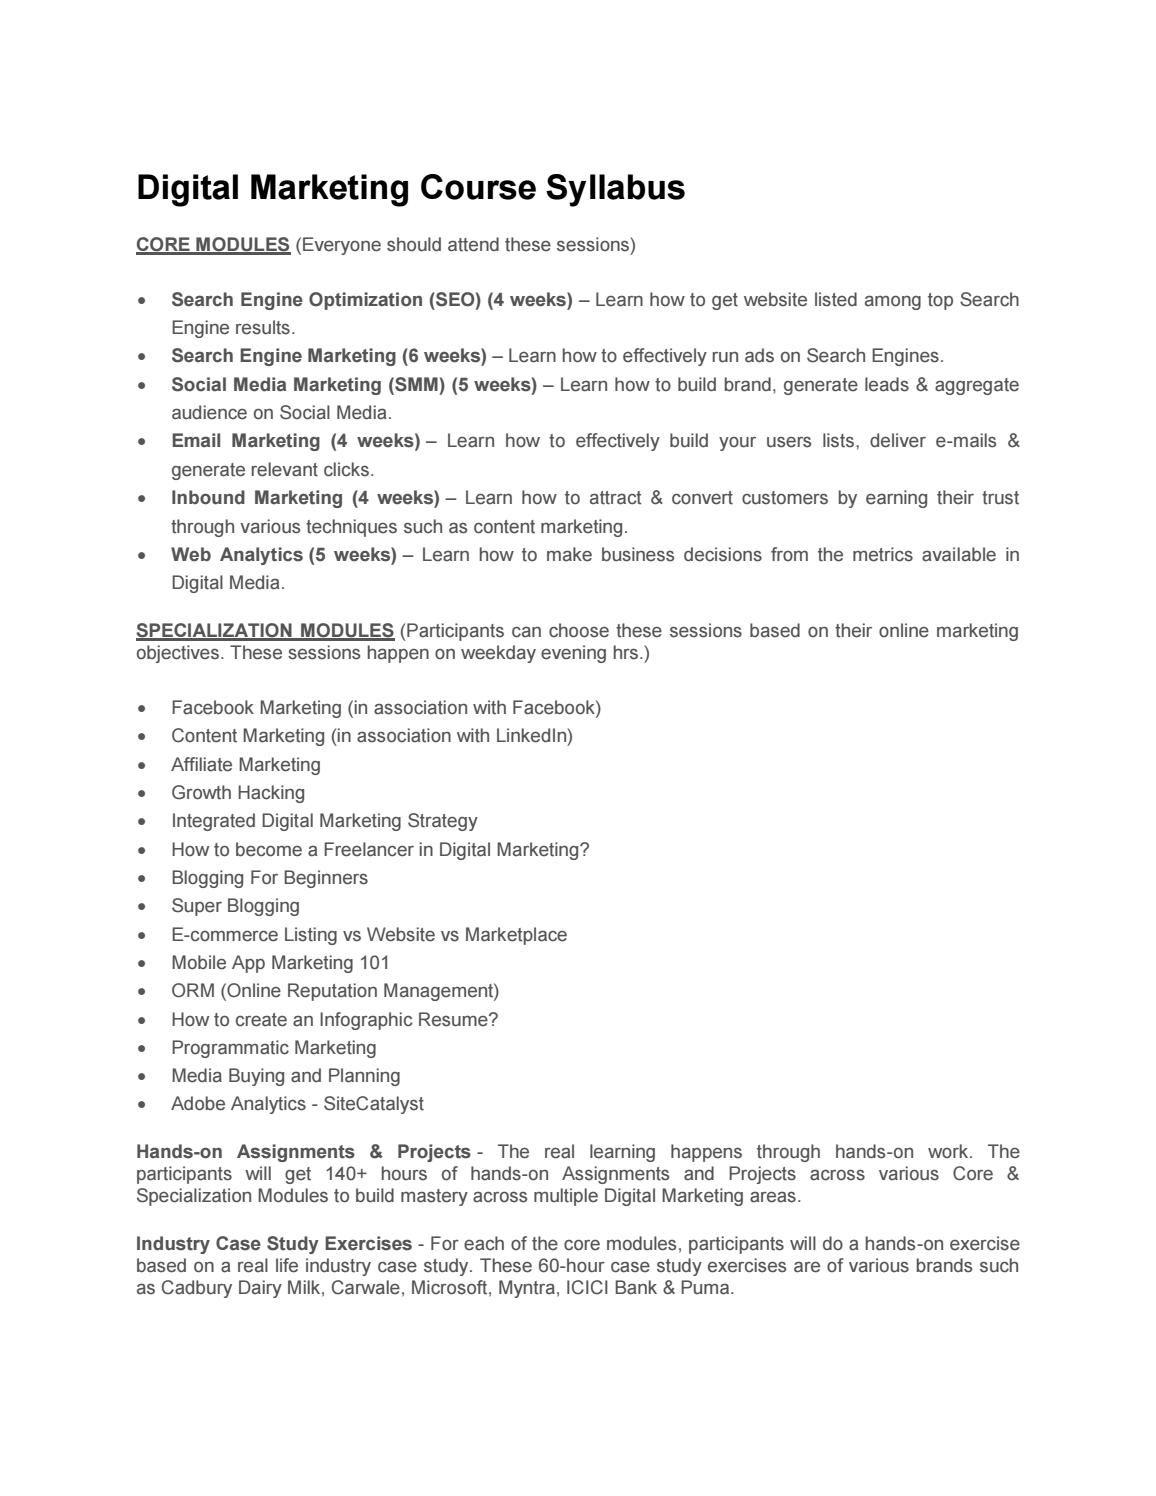 Digital Marketing Course Syllabus Marketing Courses Digital Marketing Syllabus